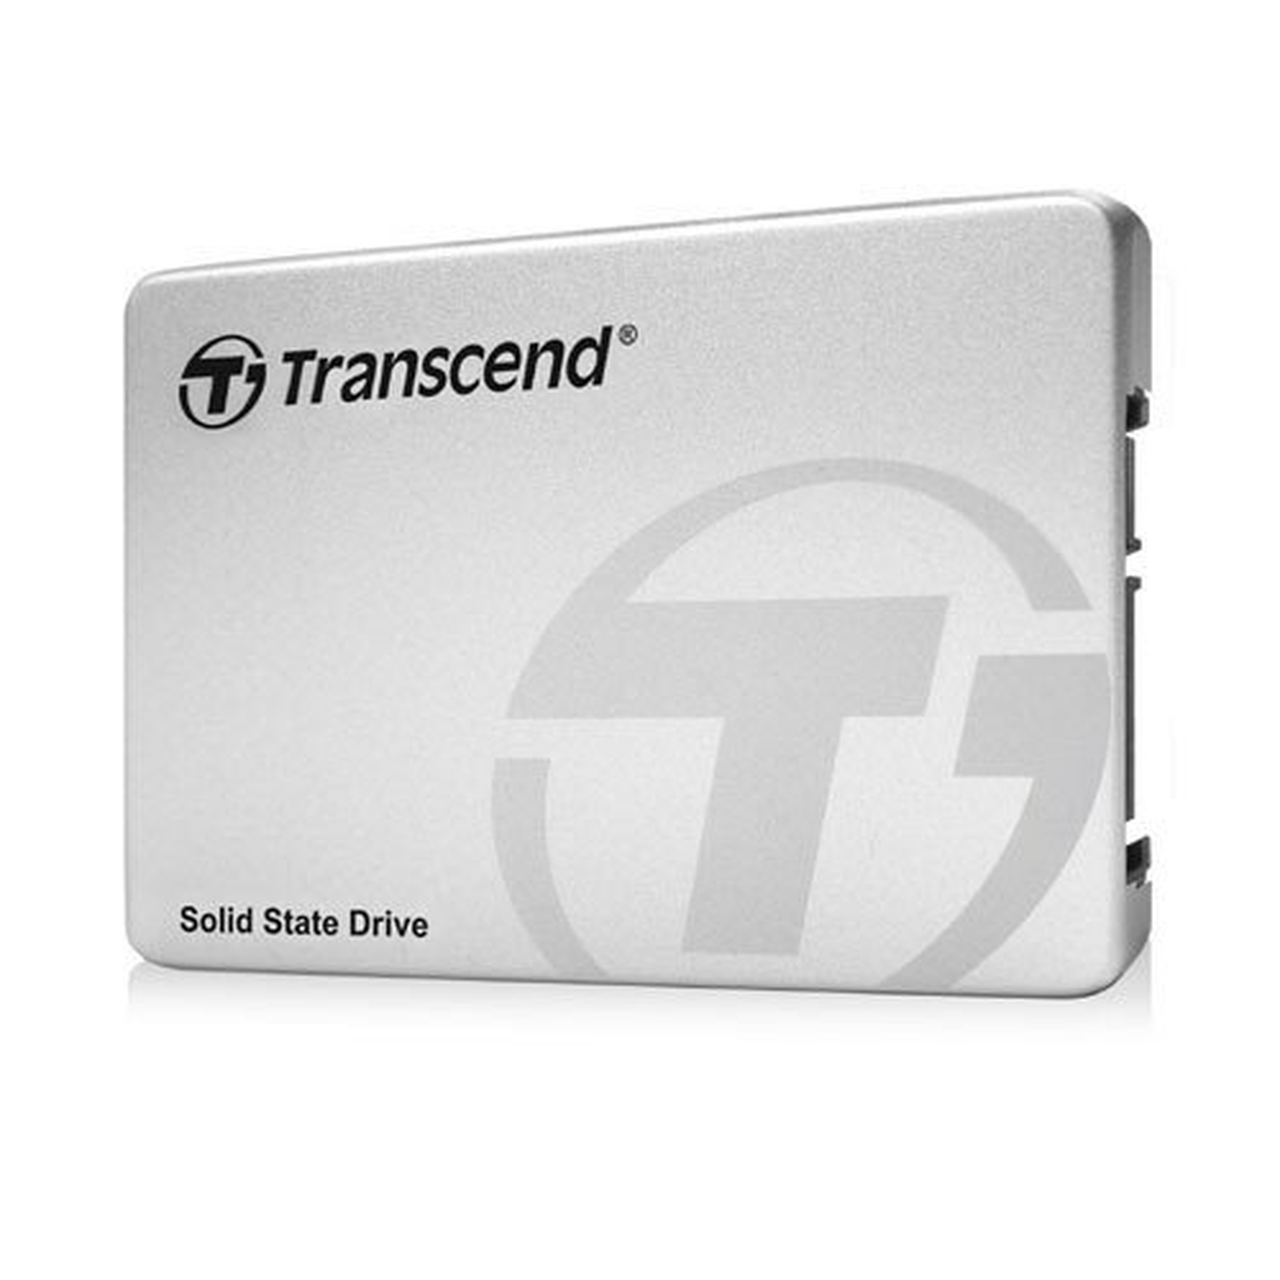 Transcend SSD 2.5インチ 256GB SATAIII対応 換装 [TS256GSSD370S]【送料無料】